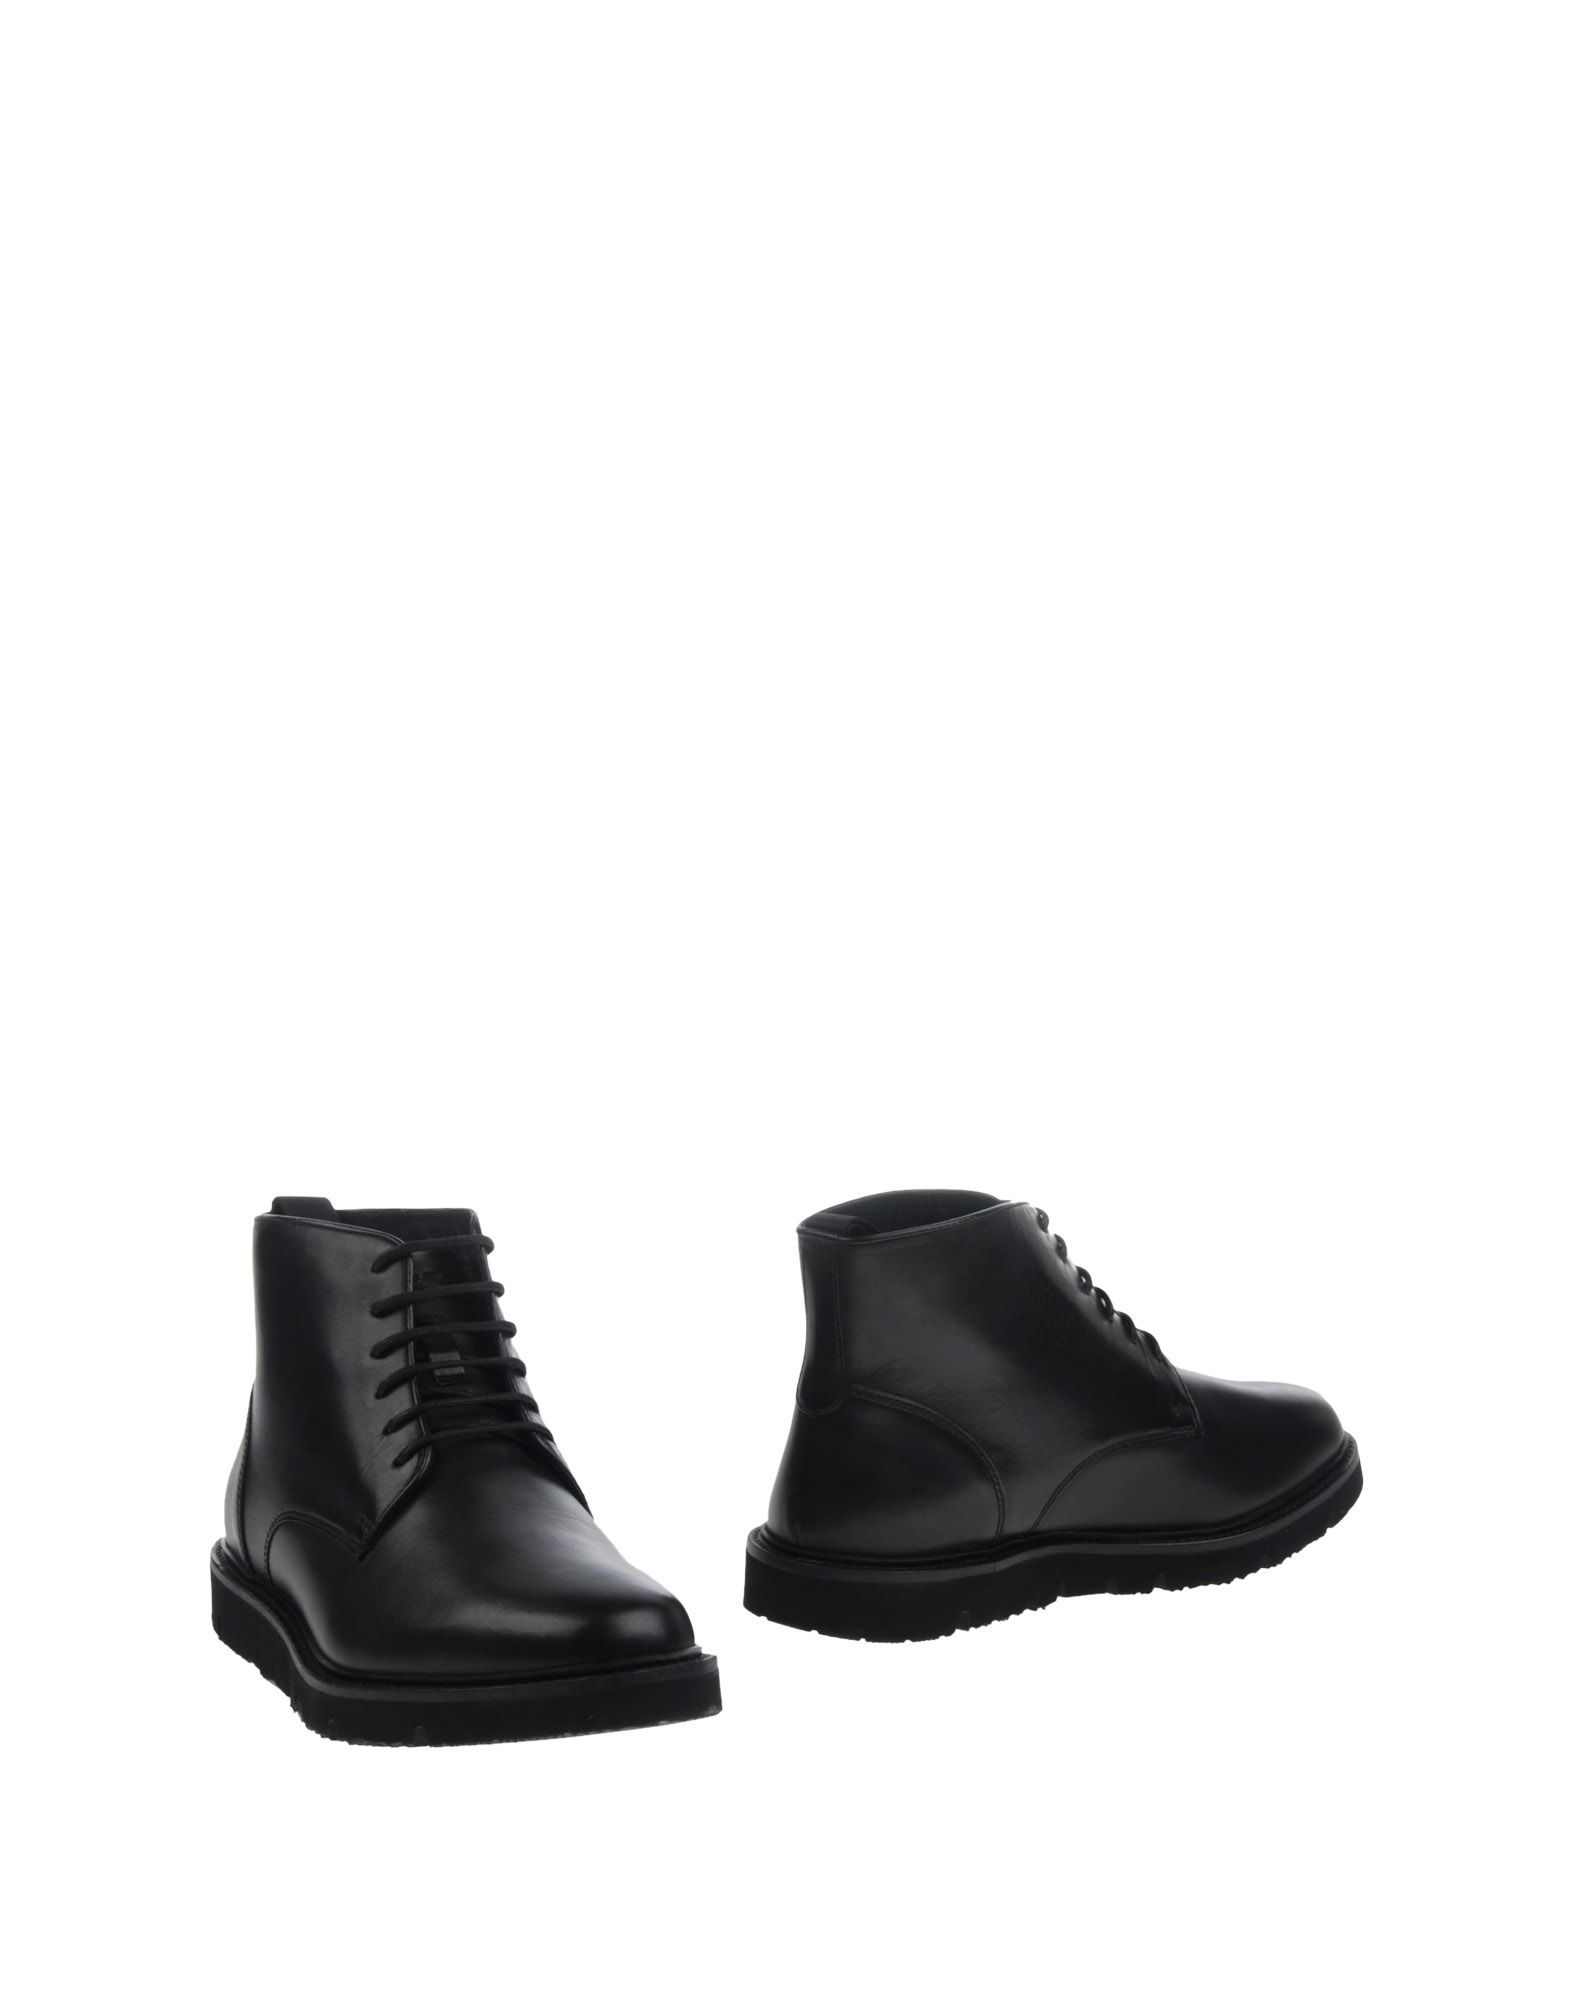 Armani Jeans  Stiefelette Herren  Jeans 11270507RL f5d7da